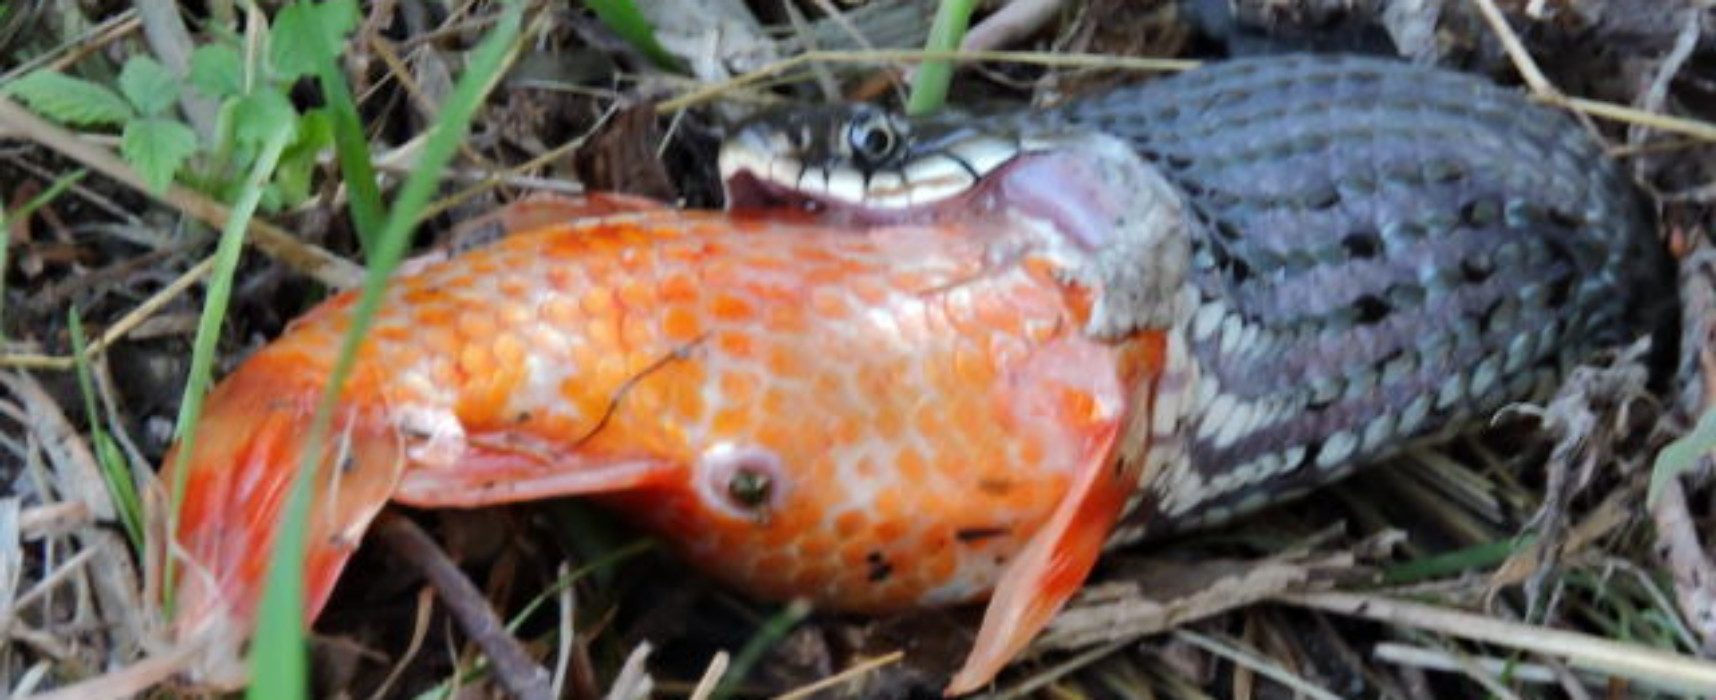 Kraß: Ringelnatter frißt großen Goldfisch in Cazis-Munté